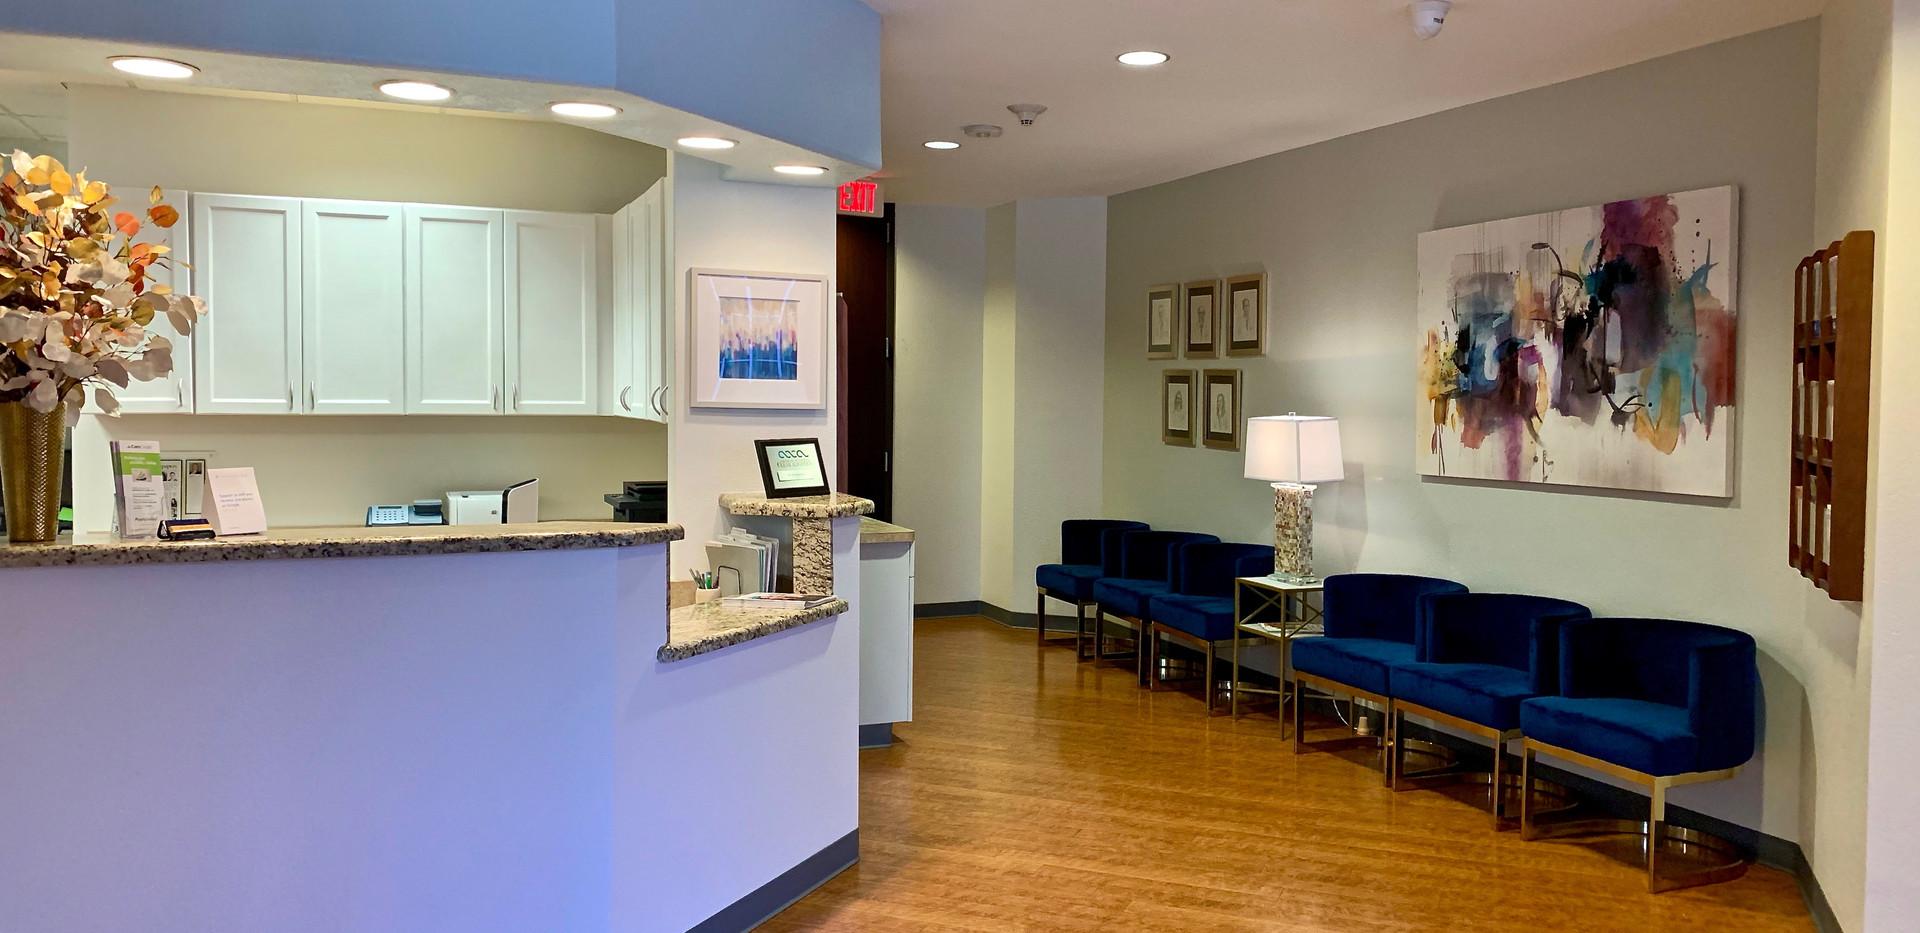 central-dentist-waiting-room.jpeg